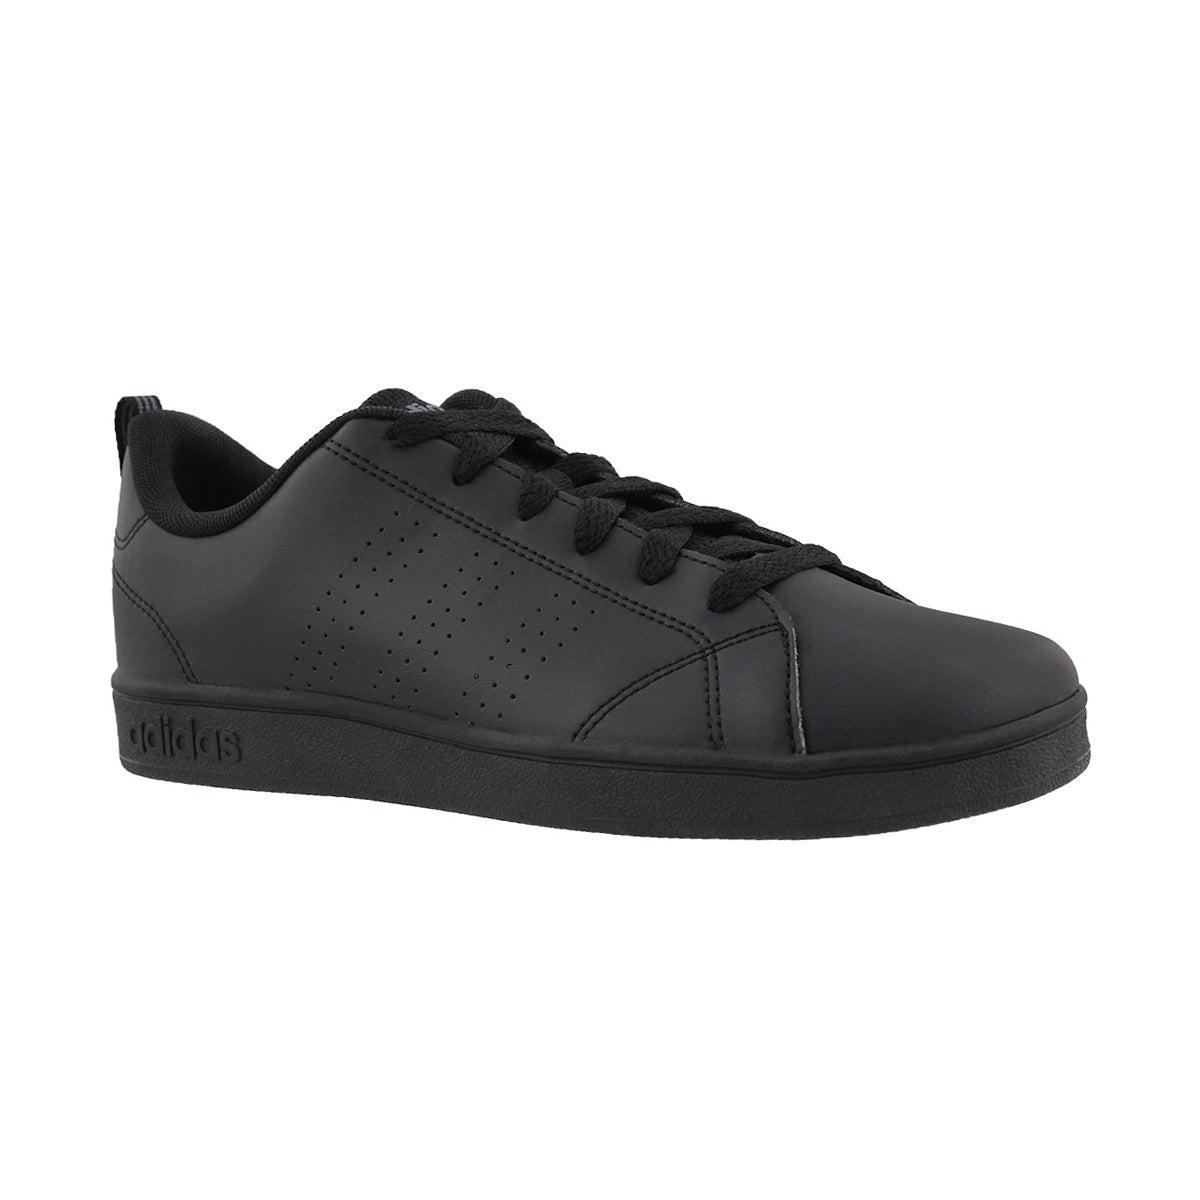 Kids' ADVANTAGE CLEAN black sneakers